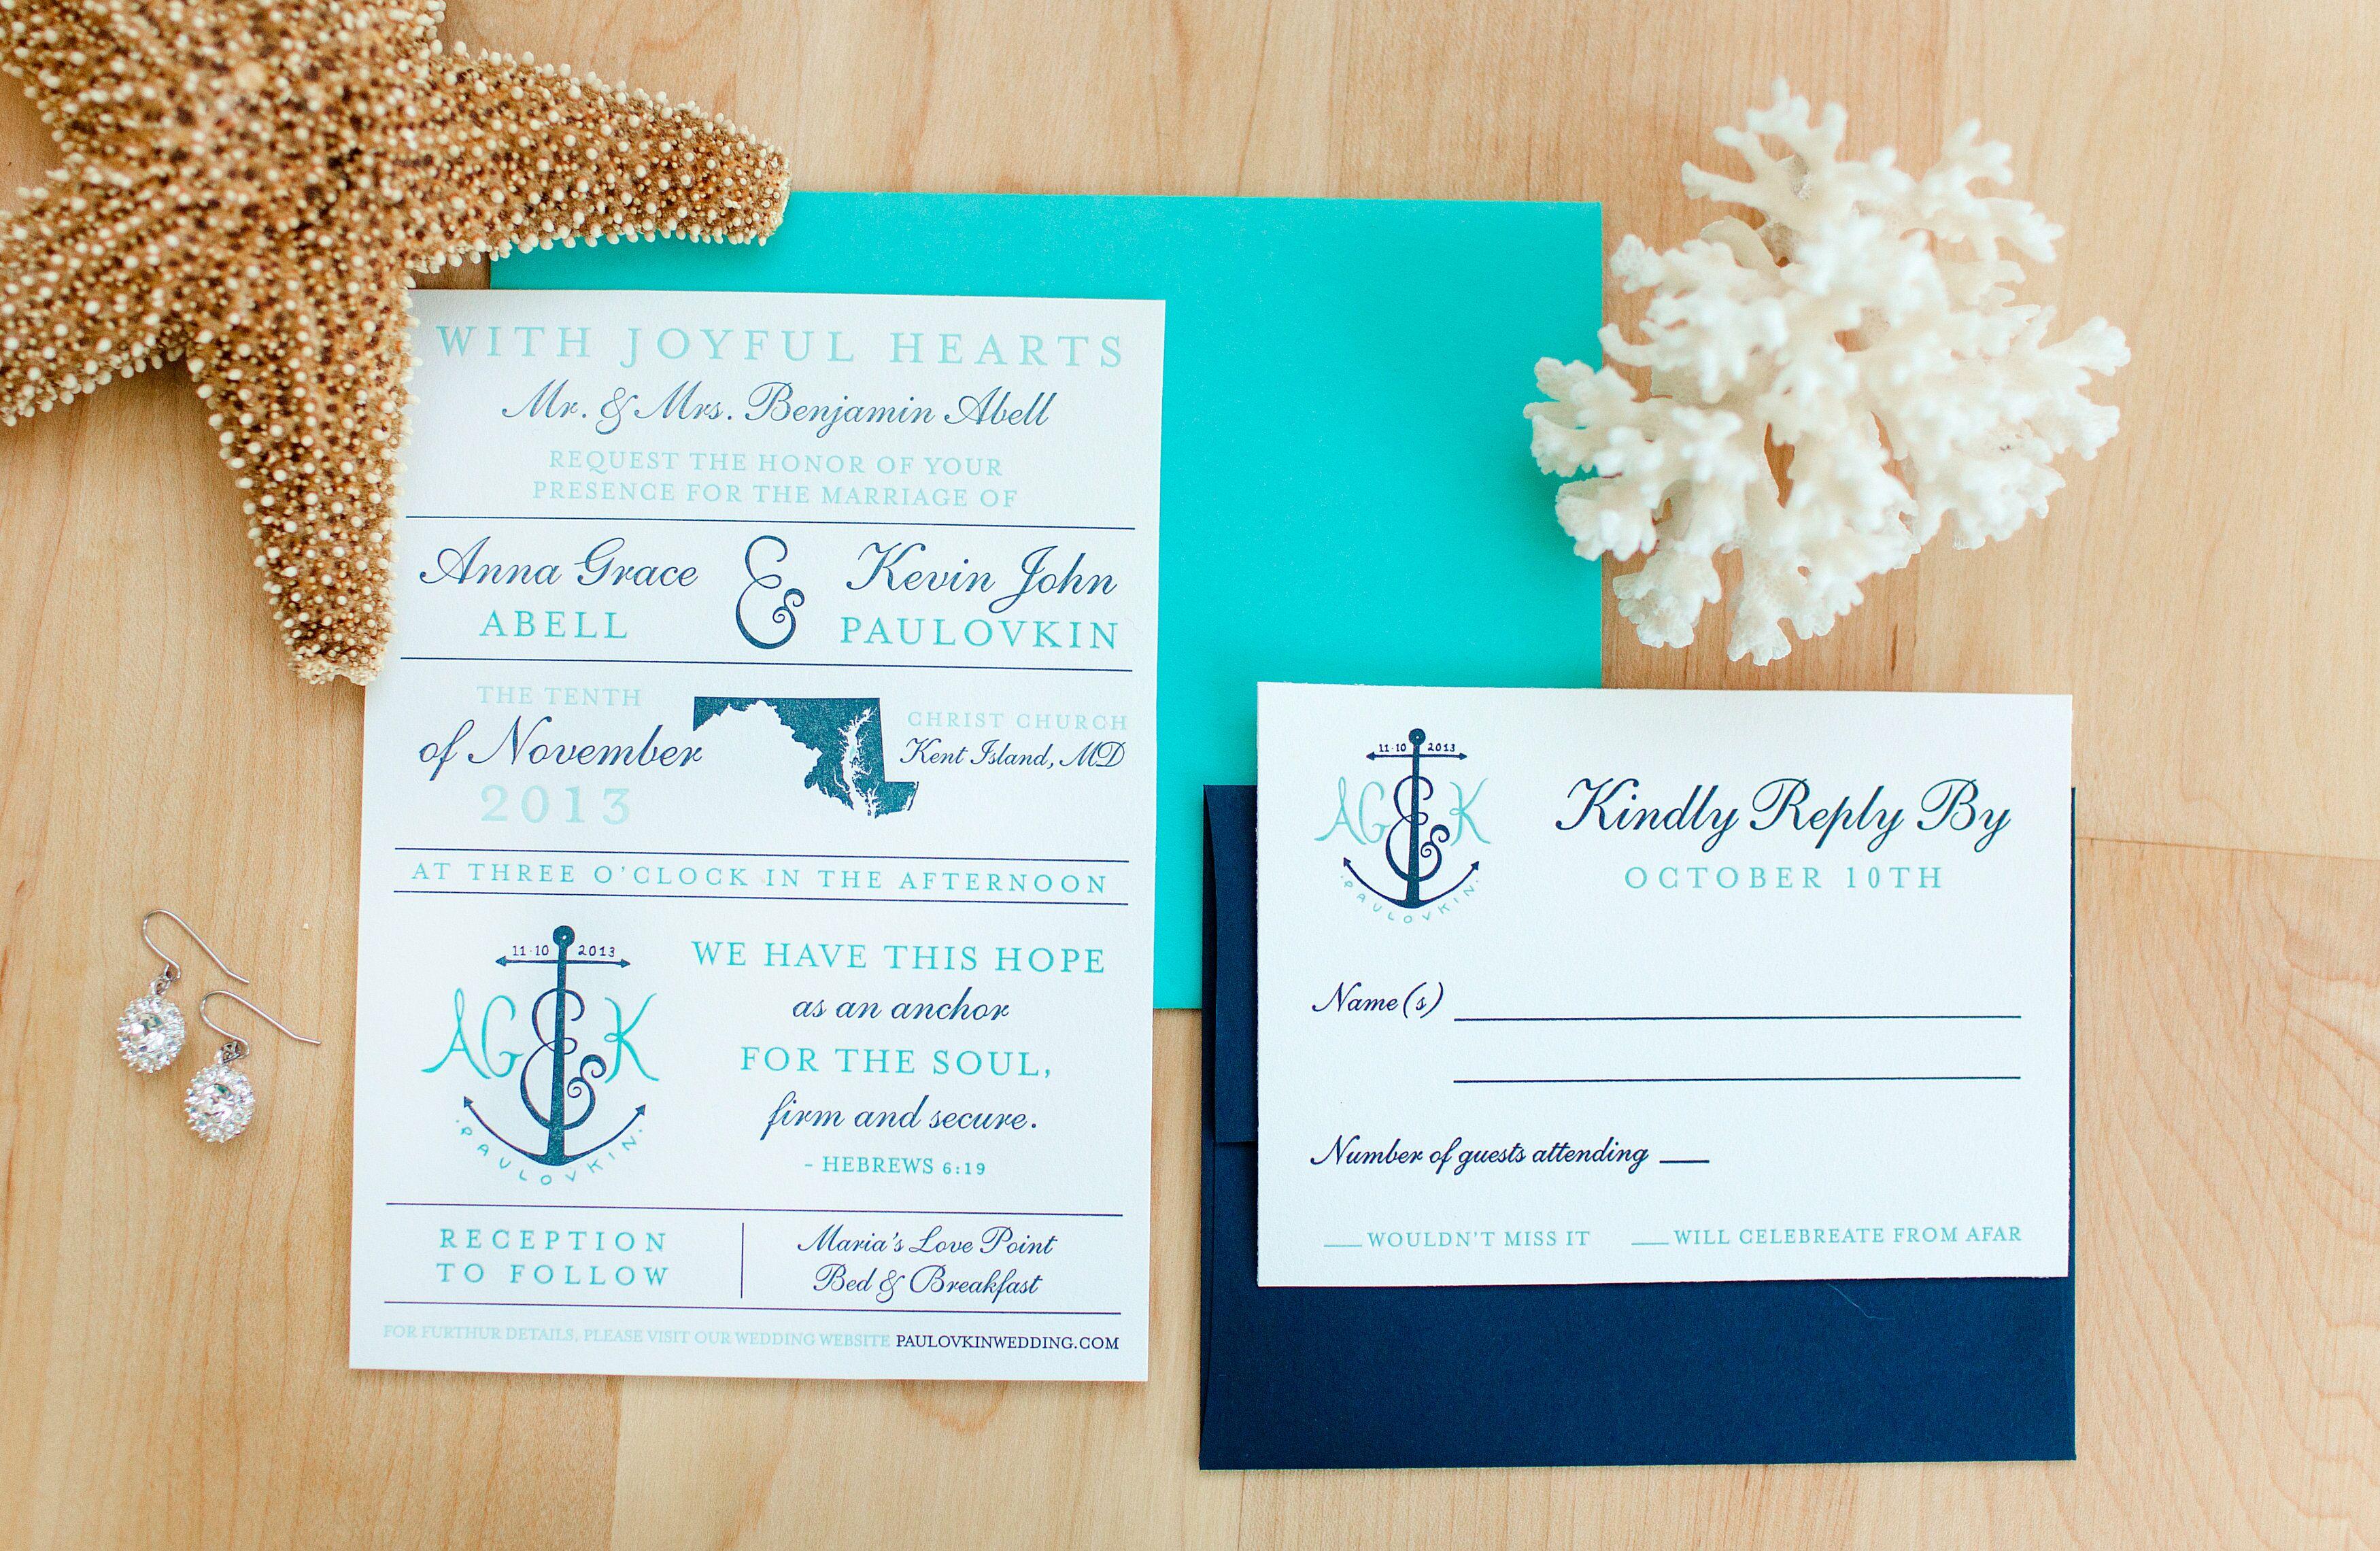 paper source annapolis Free custom designed invitations, affordable invitations, unique designs wedding invitations, other invitations, save the dates call 410-544-8830.